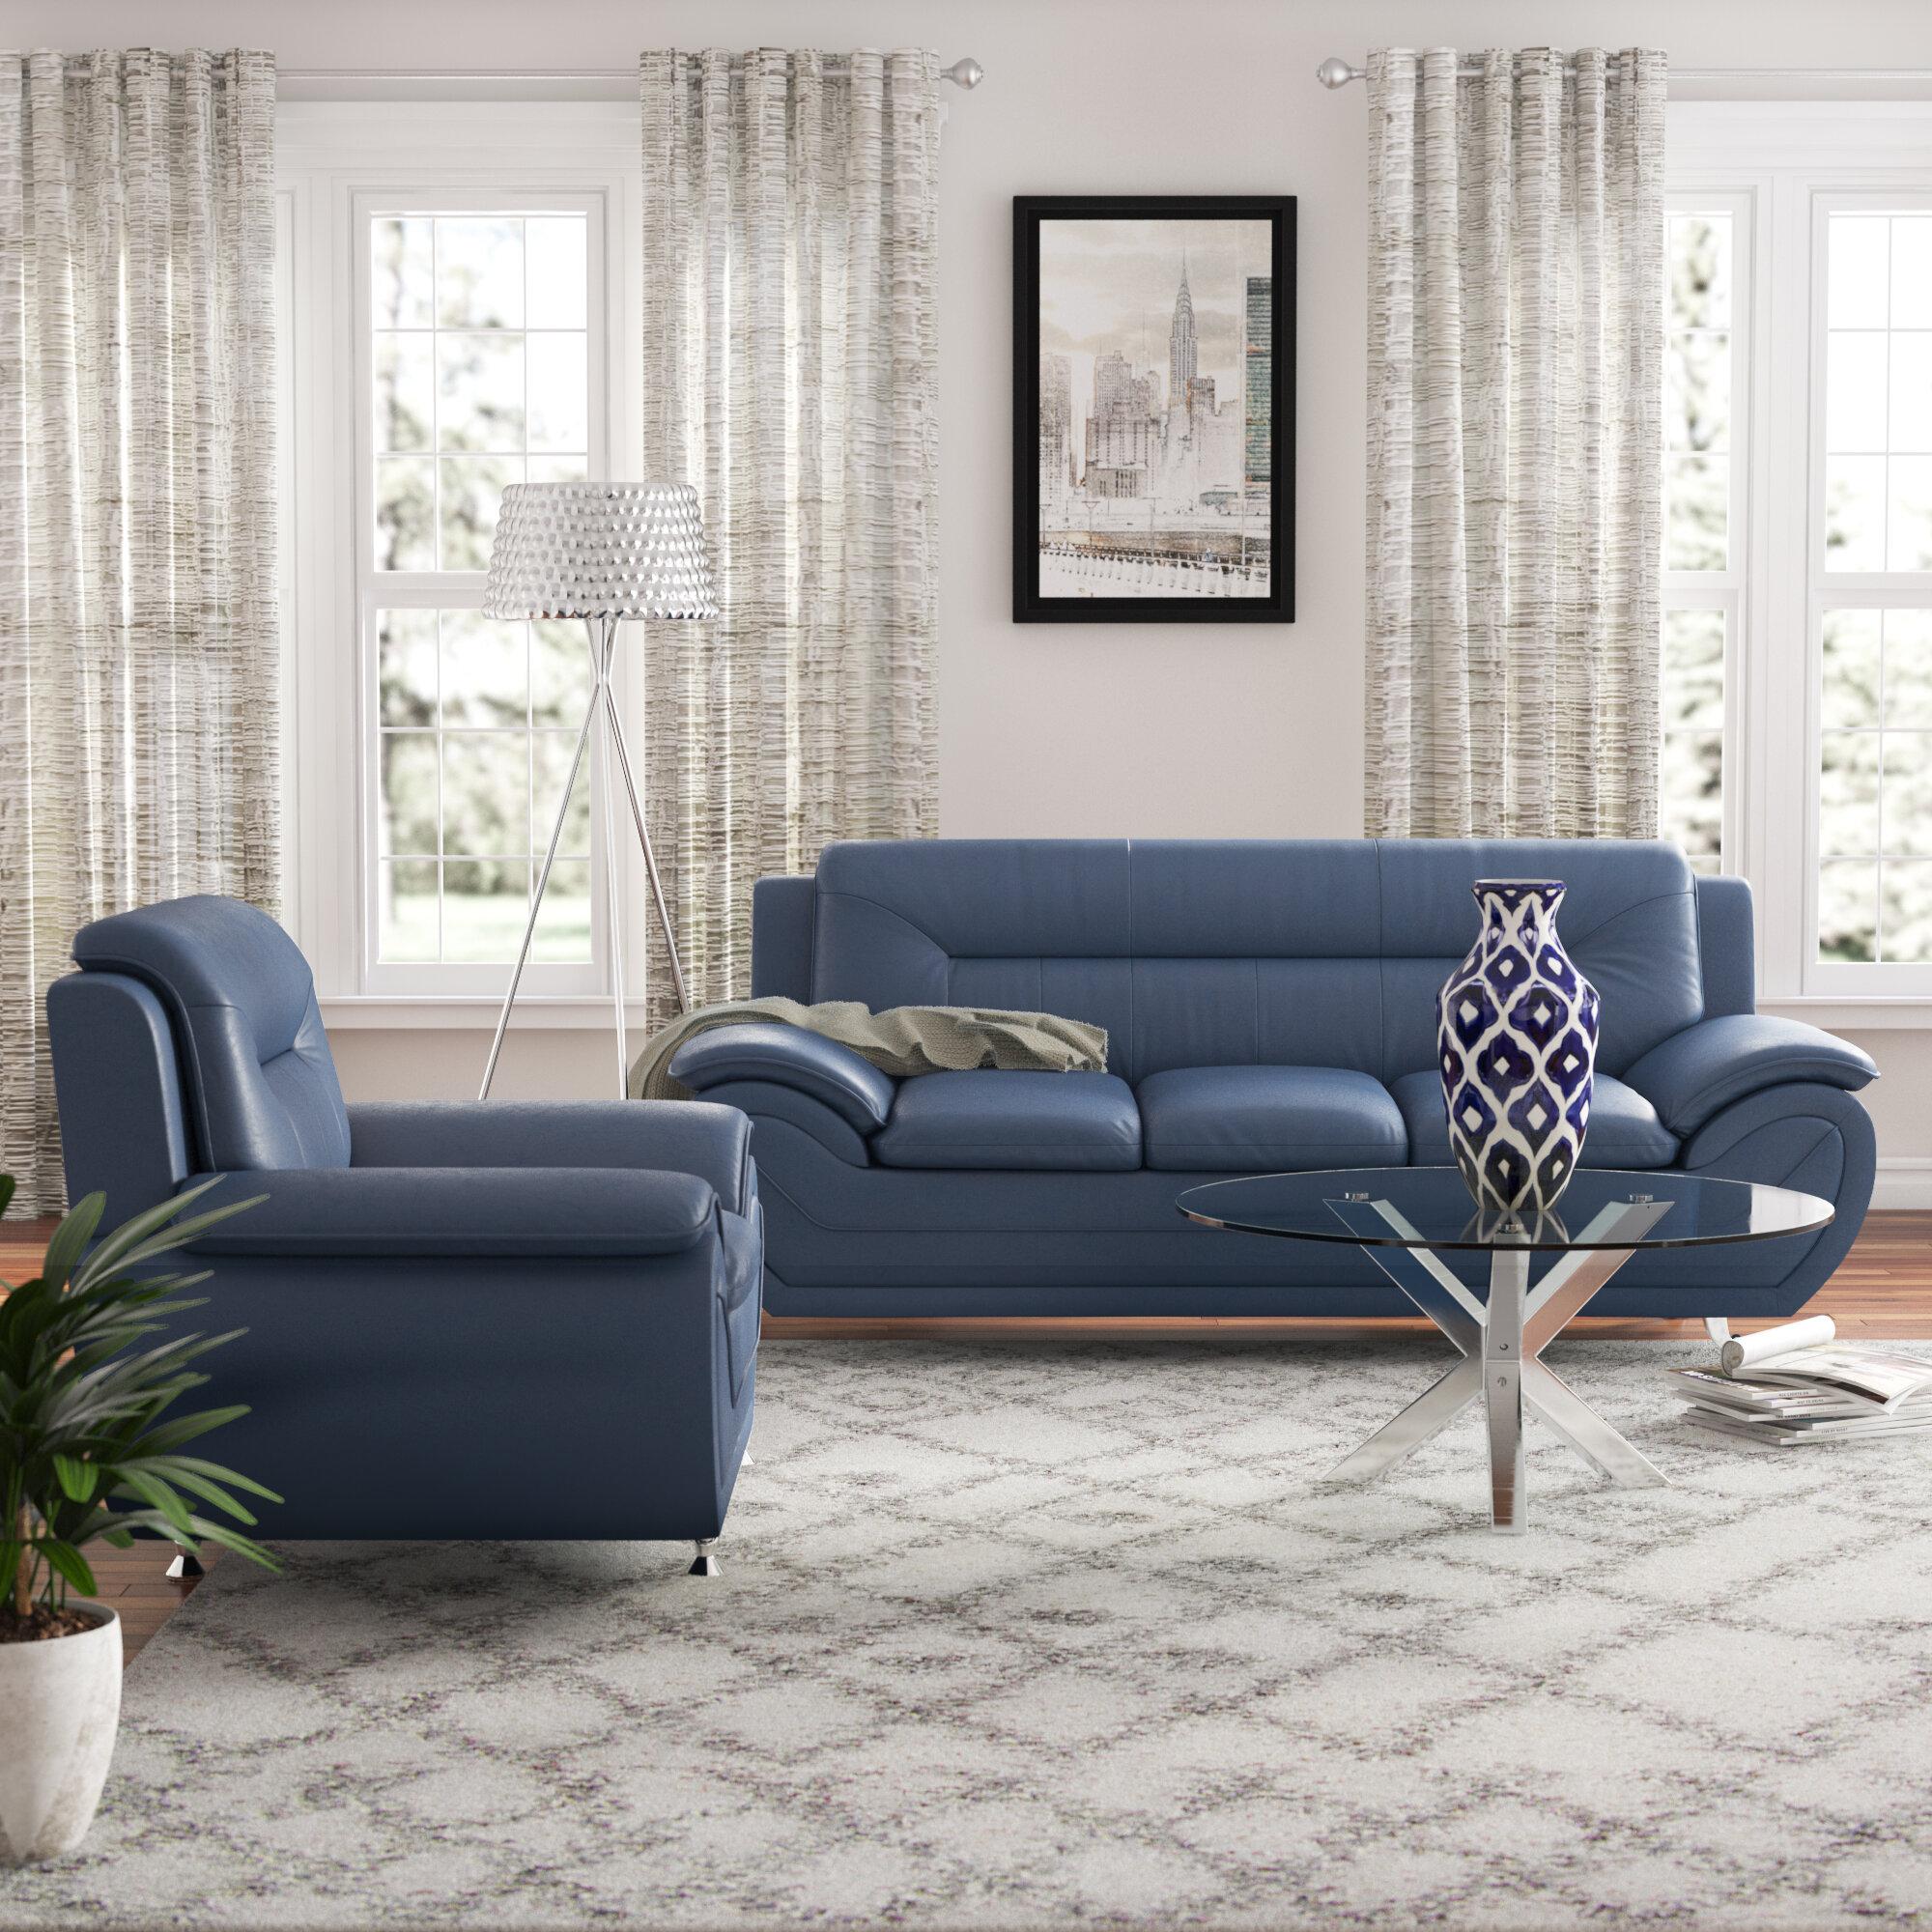 Ebern Designs Brose 2 Piece Standard Living Room Set Wayfair